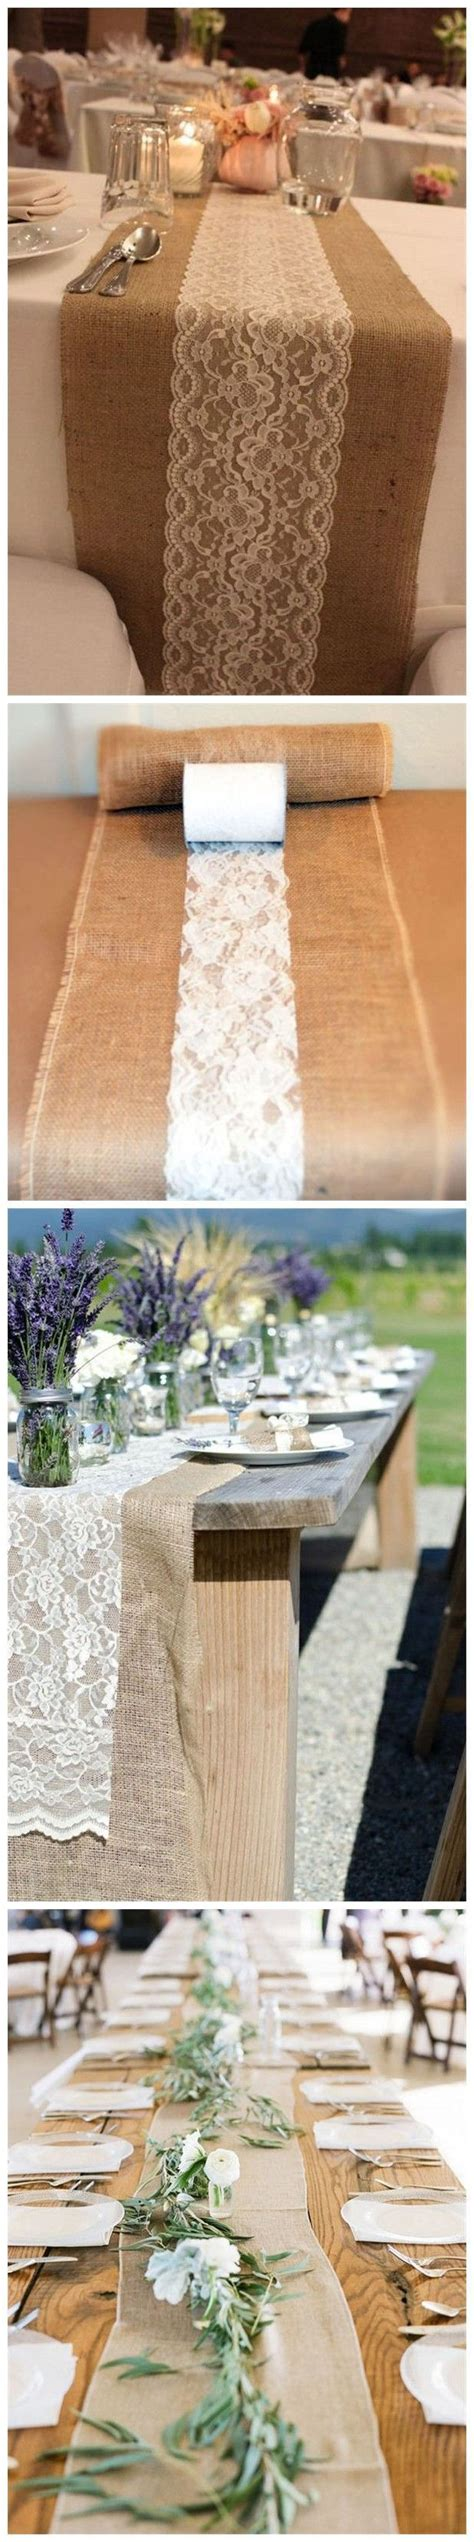 diy table runner ideas best 25 wedding table runners ideas on rustic